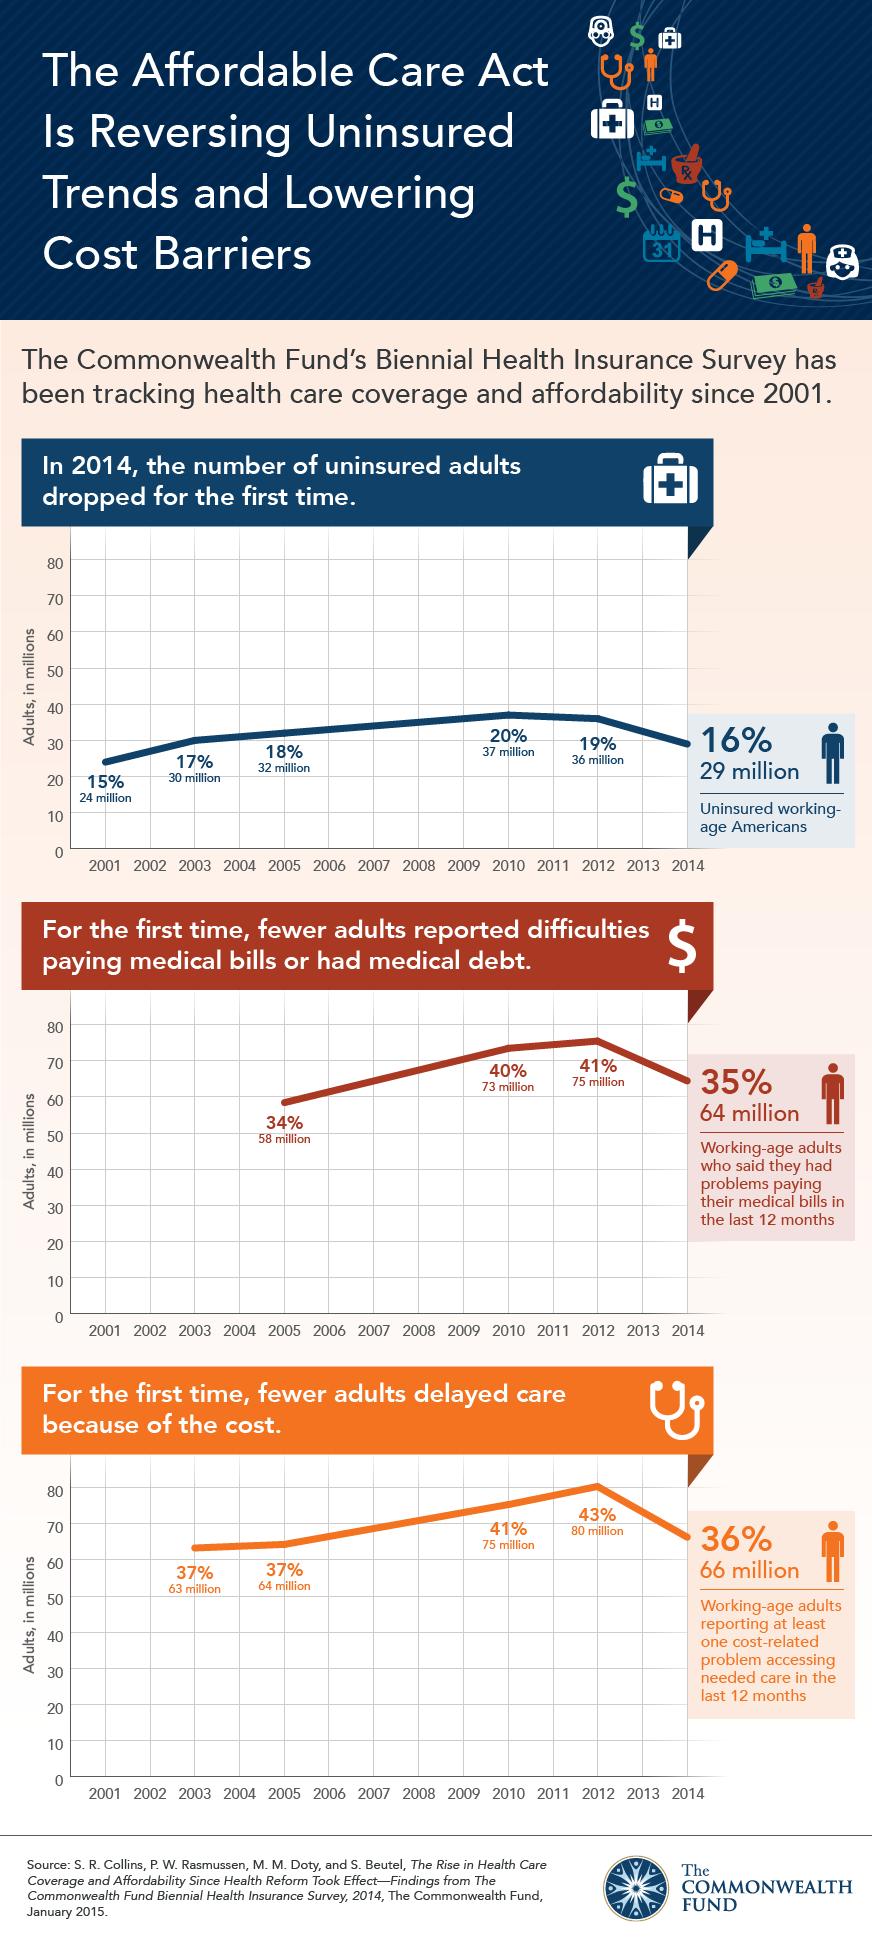 ACA trends in uninsured